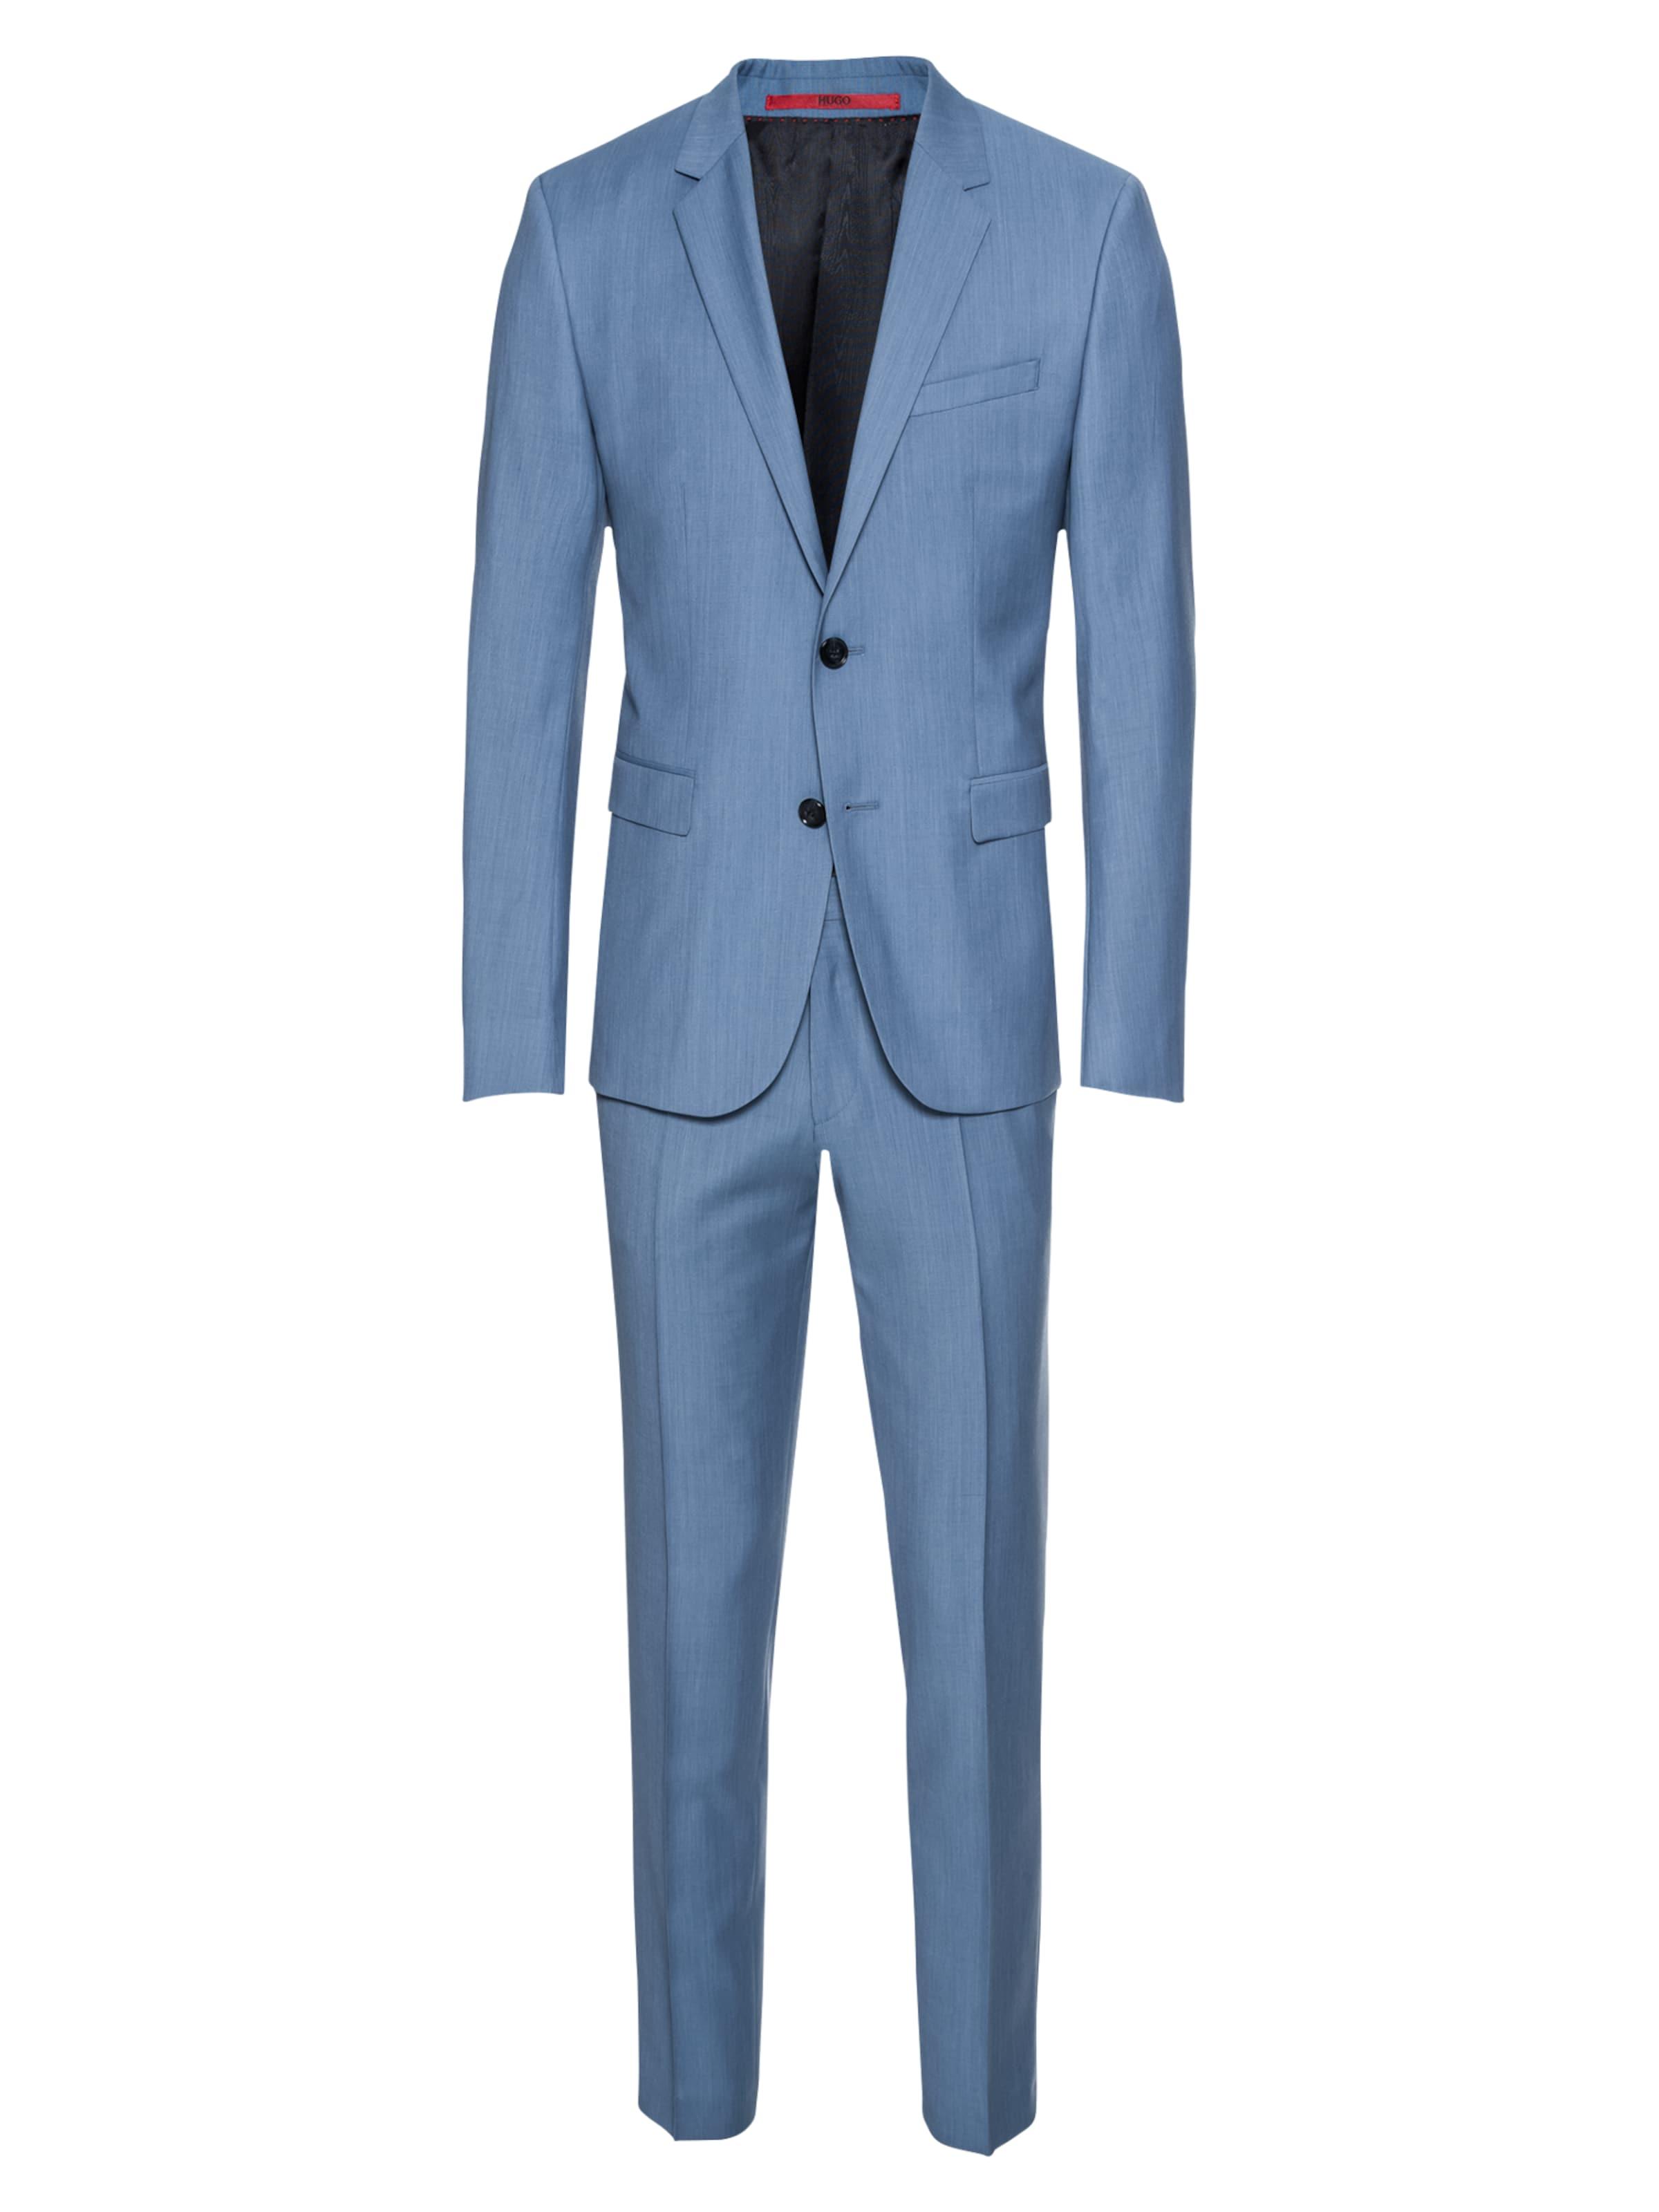 'astian 10207904 En Costume 01' Hugo hets182 Bleu 80Nmnw